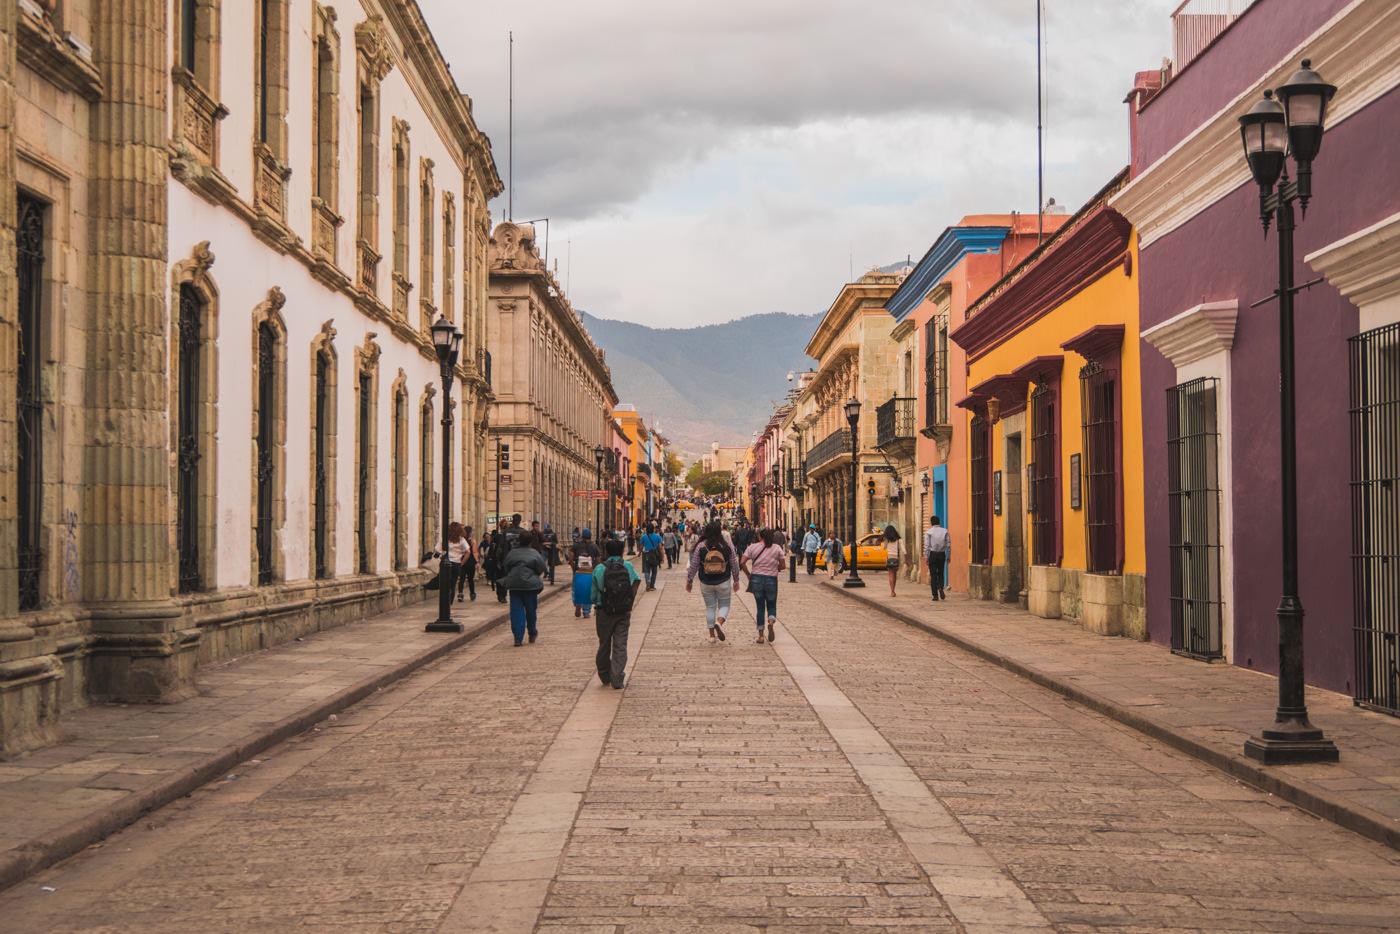 Calle Macedonio Alcala in Oaxaca